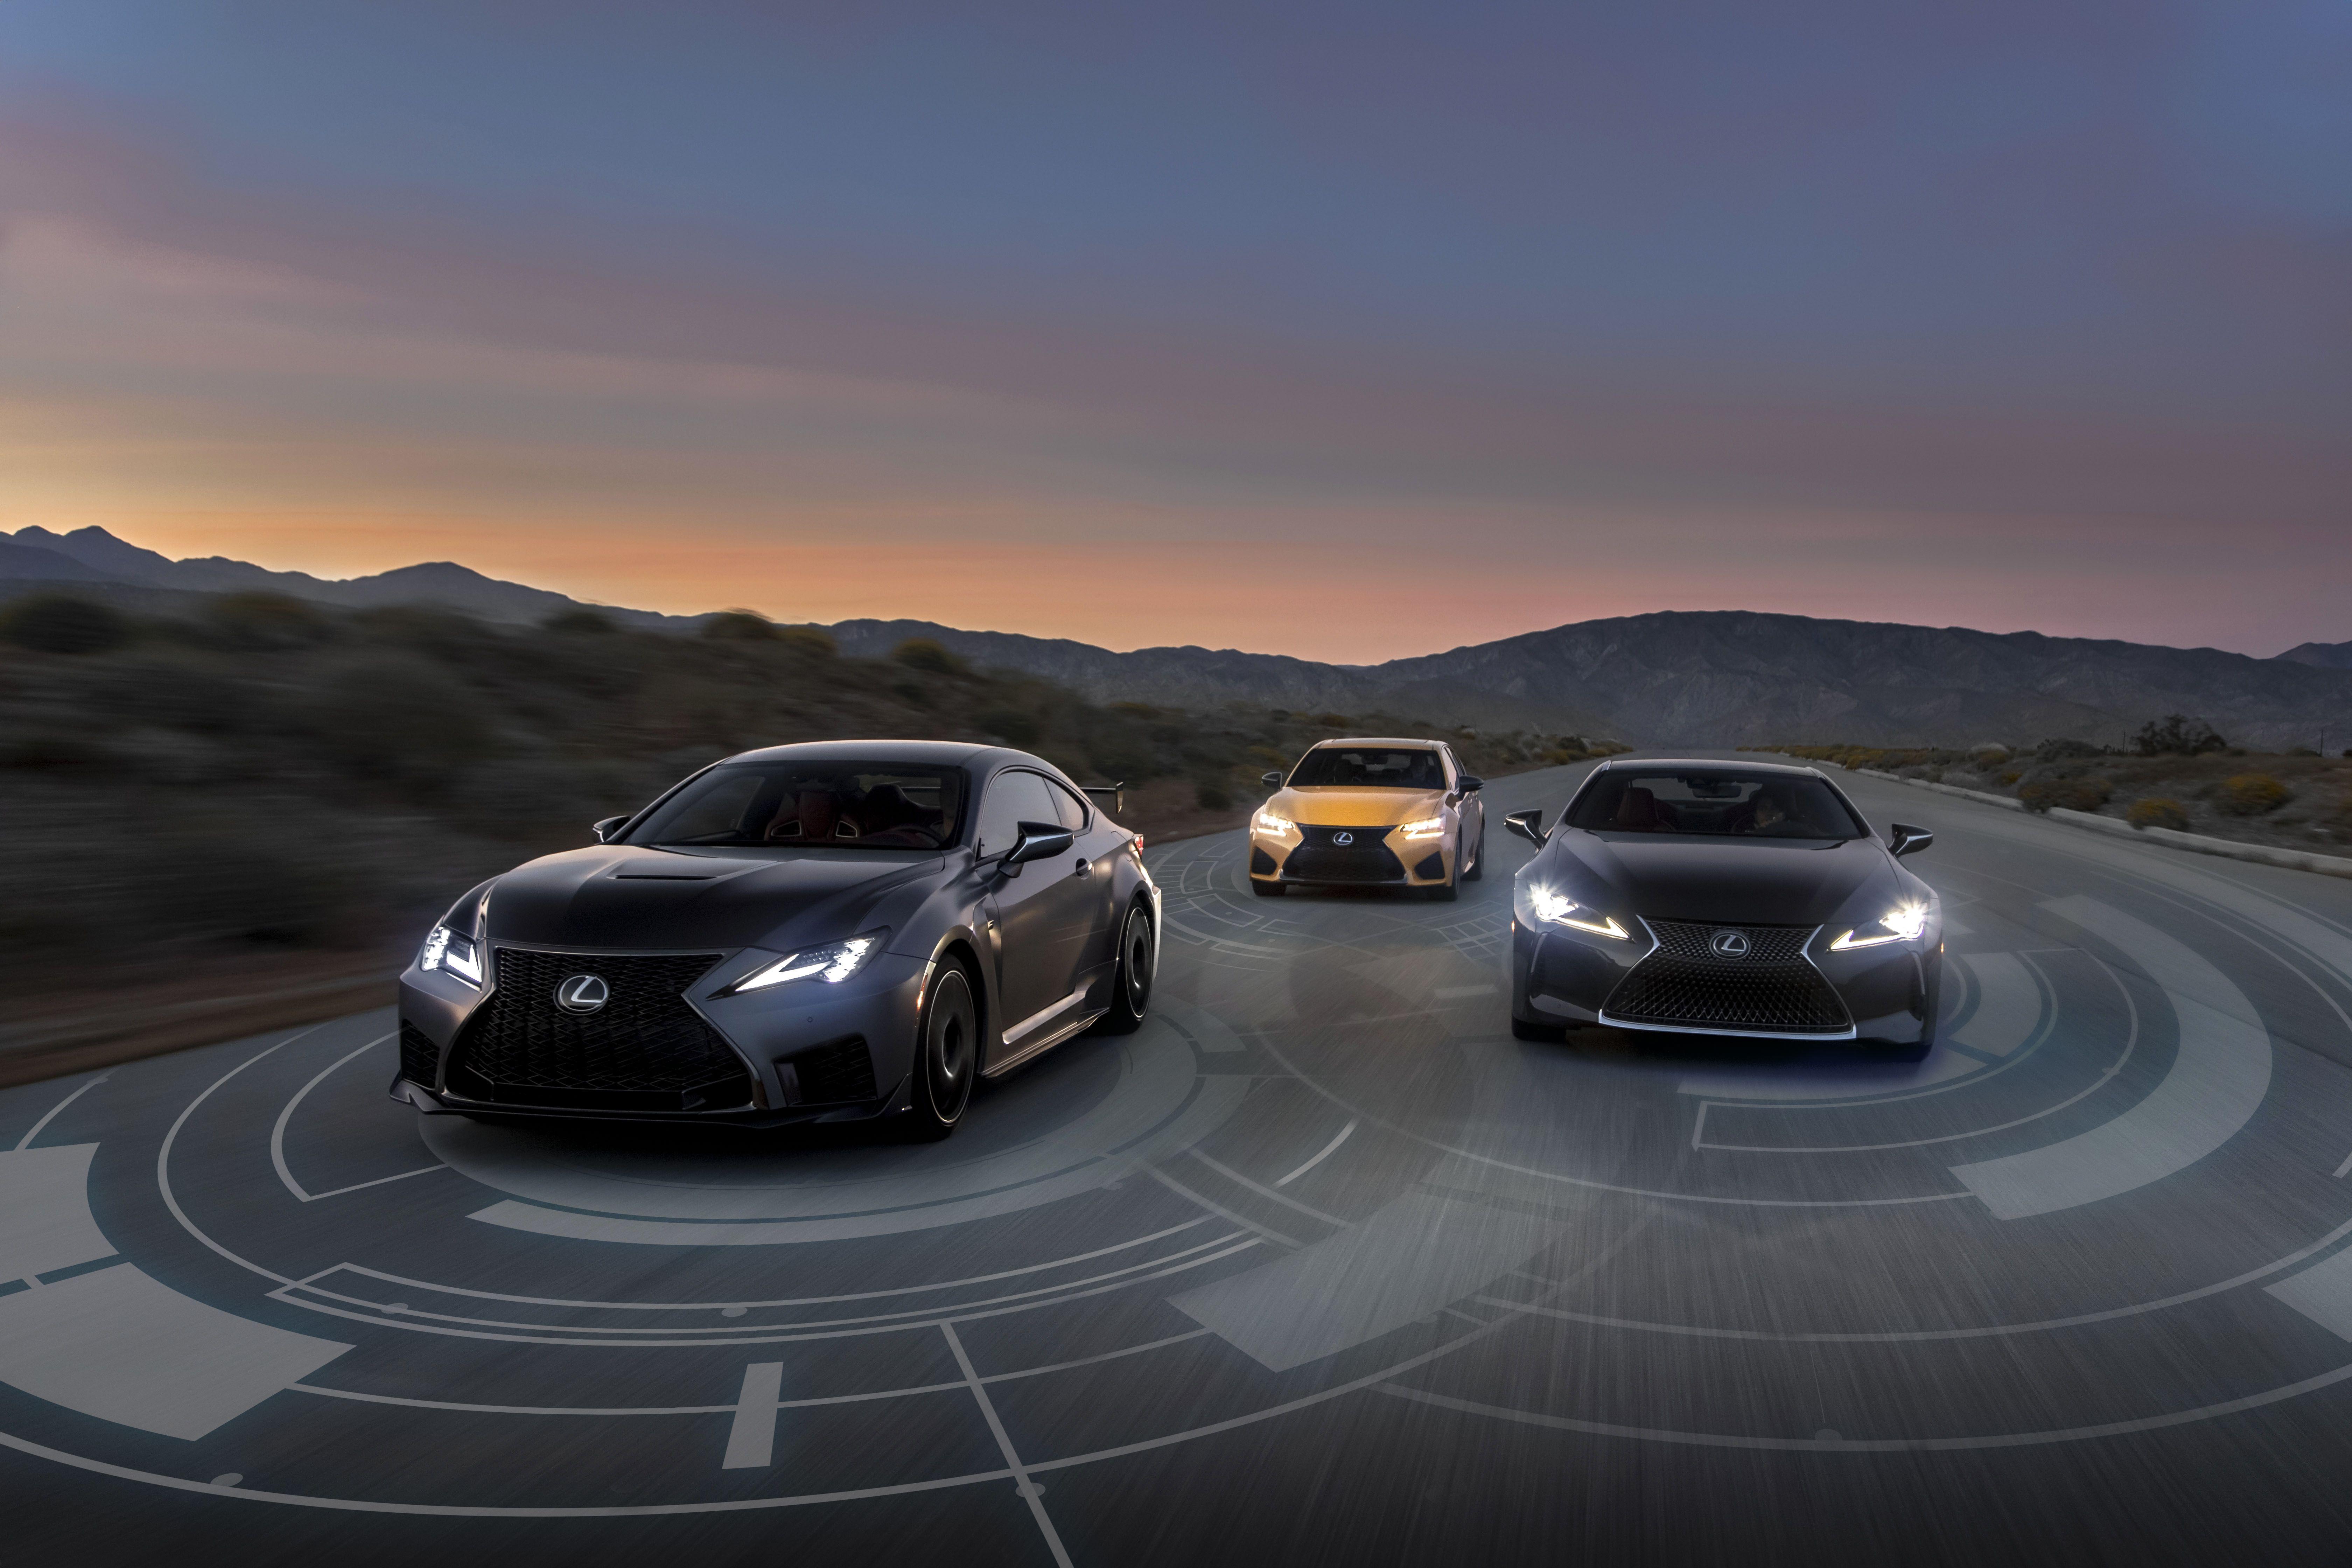 Gunner G1 Intermediate Kennel Tested Lexus, Lexus cars, Car